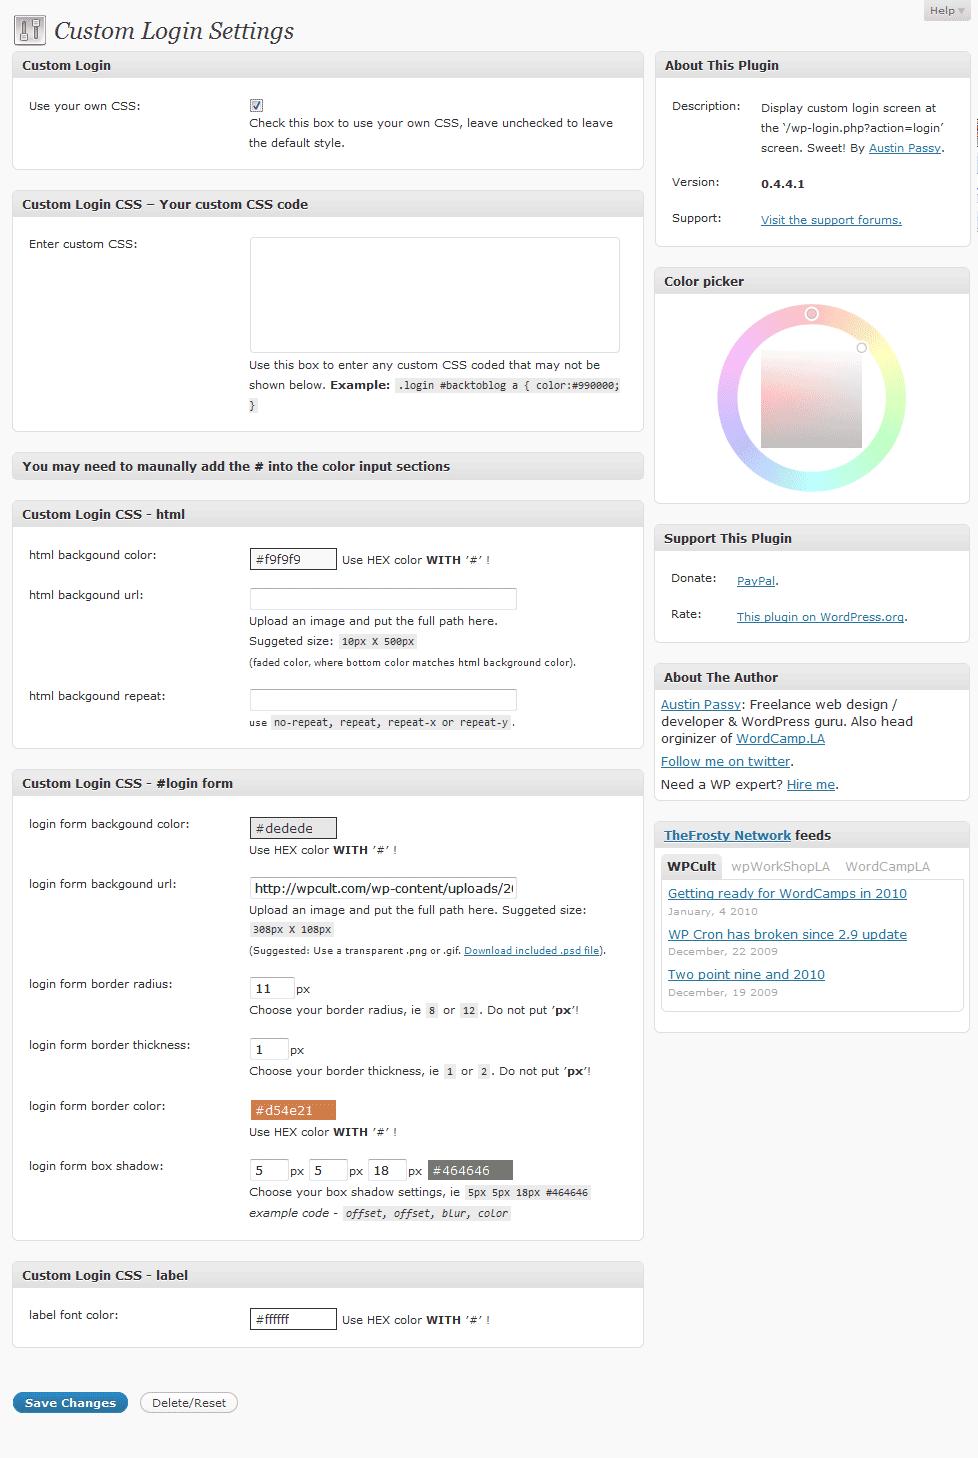 custom-login-settings-page